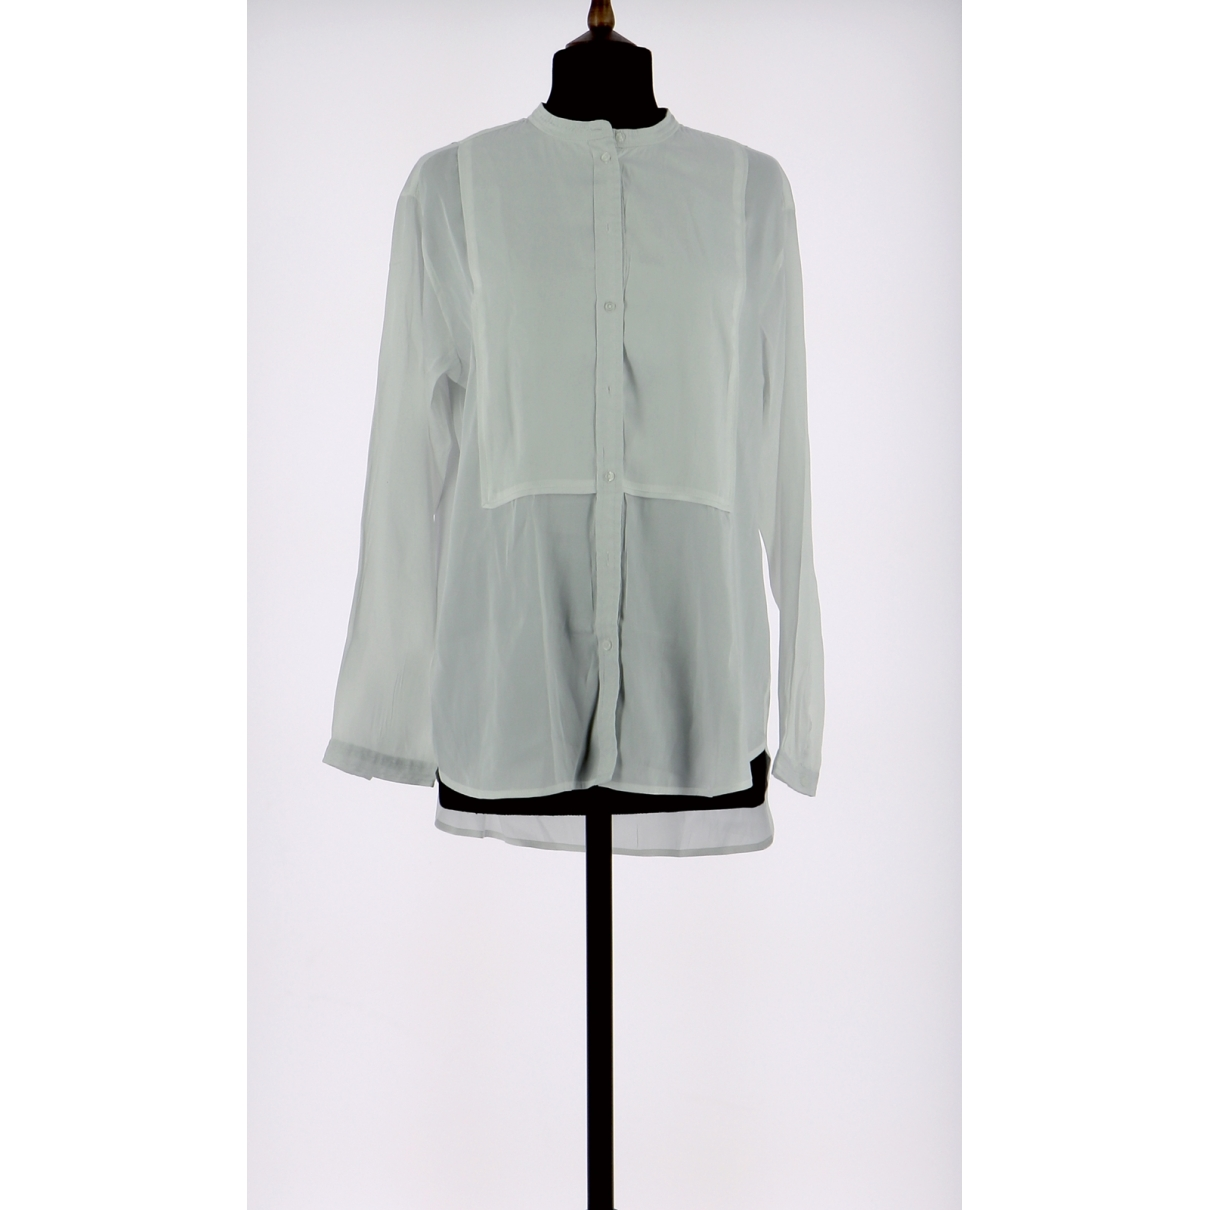 American Vintage \N Top in  Weiss Polyester